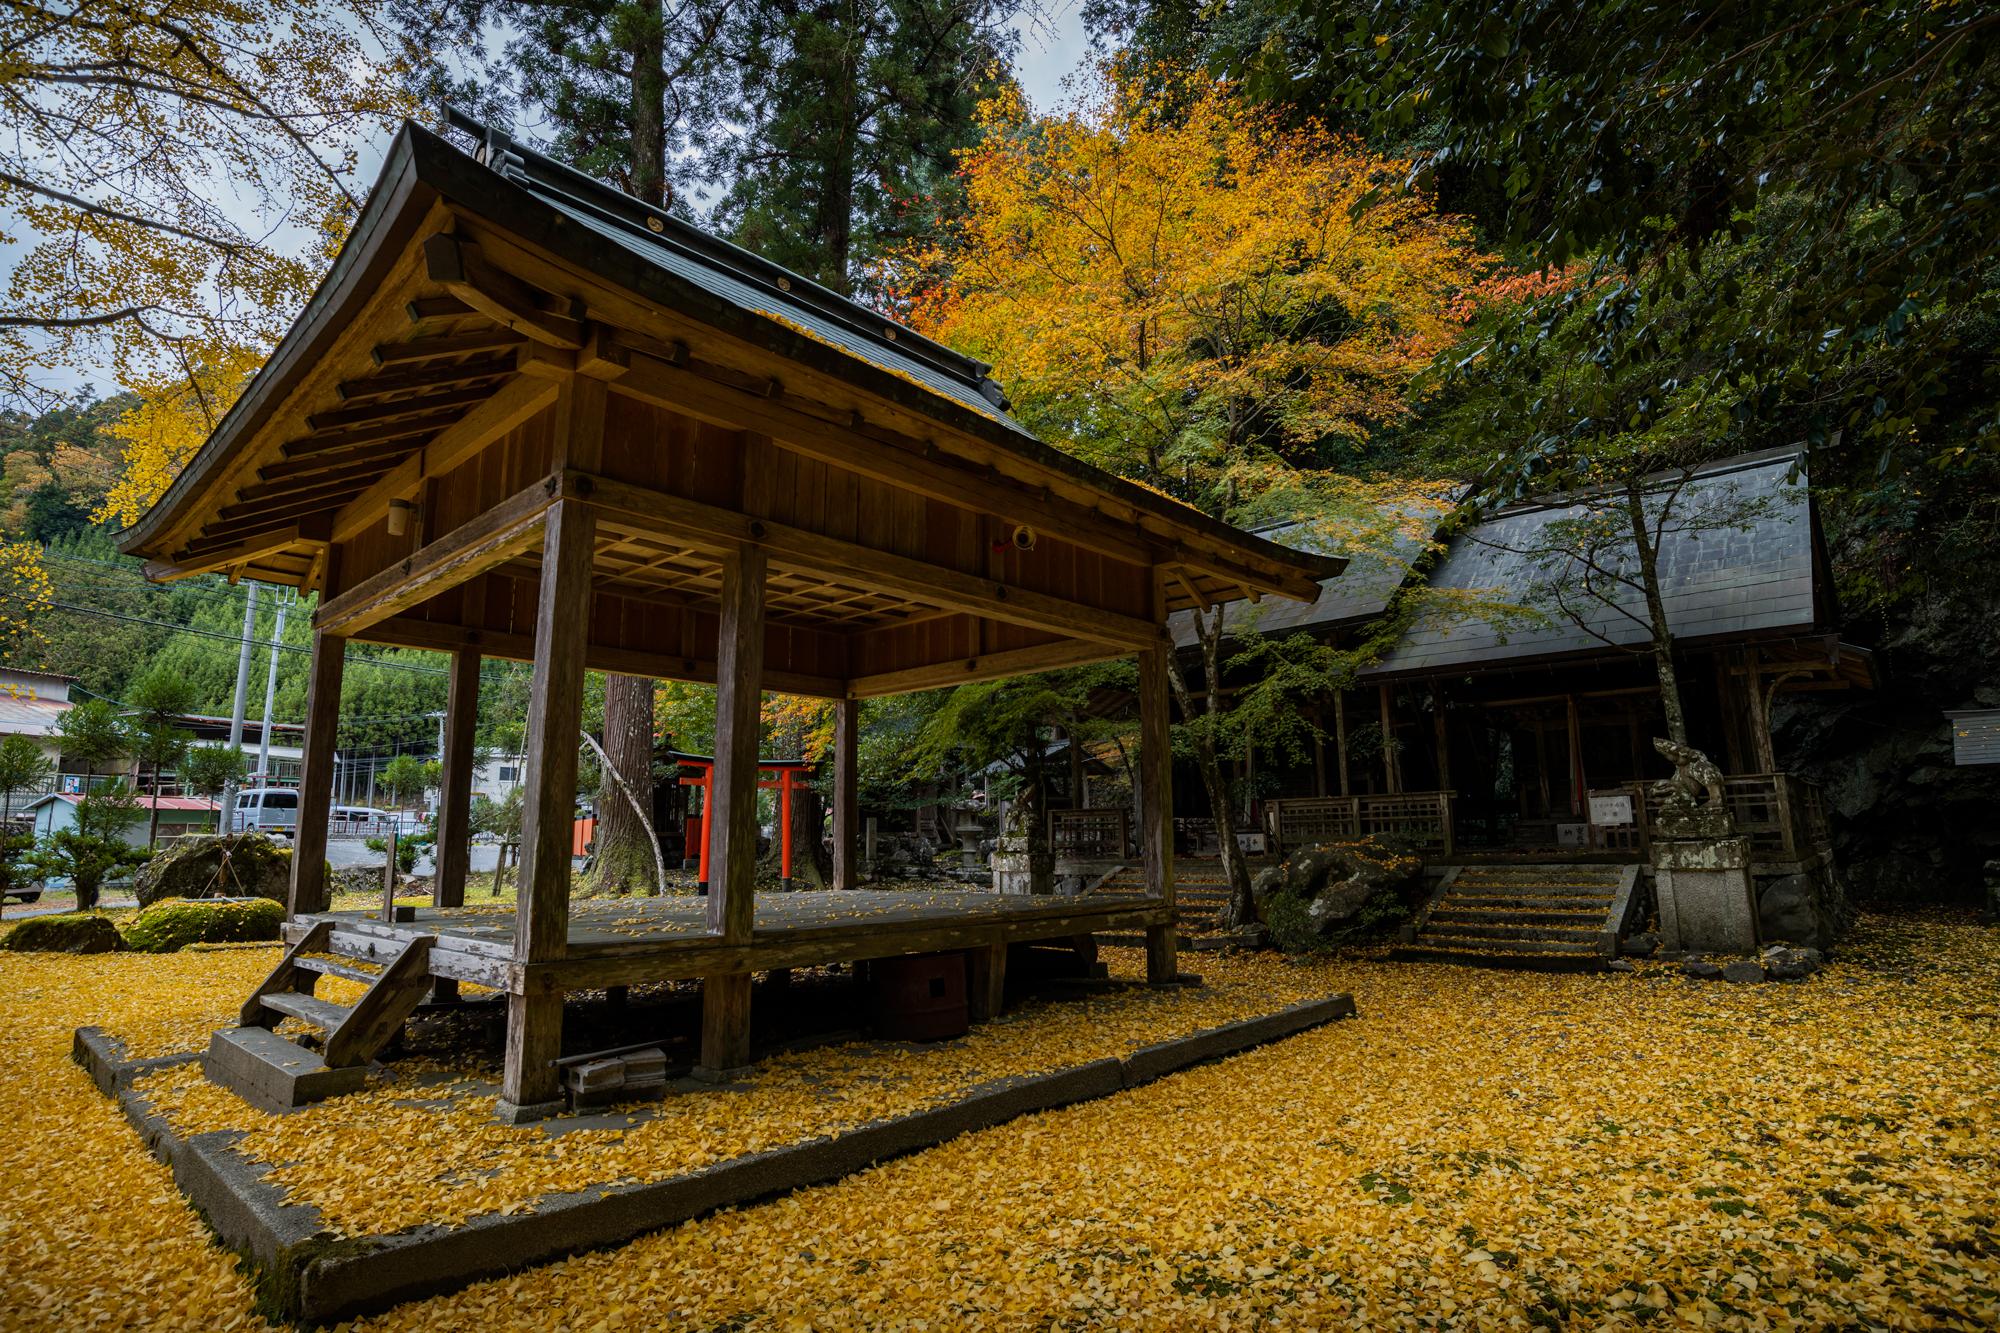 NIKON-CORPORATION_NIKON-D850_3019850546-3019962433_21398 京都  岩戸落葉神社  Kyoto Iwato Ochiba Jinja( 2019年 京都の秋、境内が黄色の絨毯に染まるイチョウのおすすめの写真スポット・アクセス情報や交通手段など!)